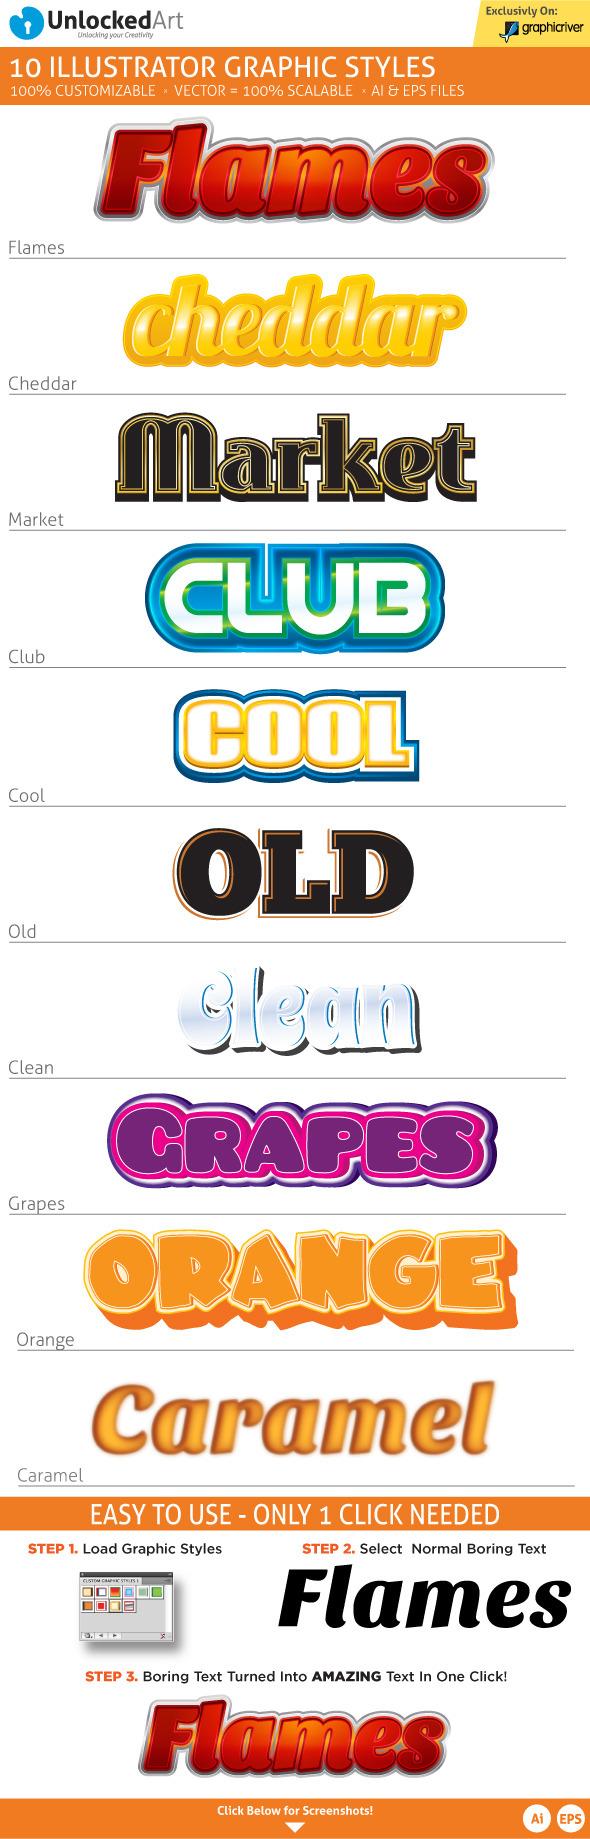 Custom Graphic Styles 2 - Styles Illustrator